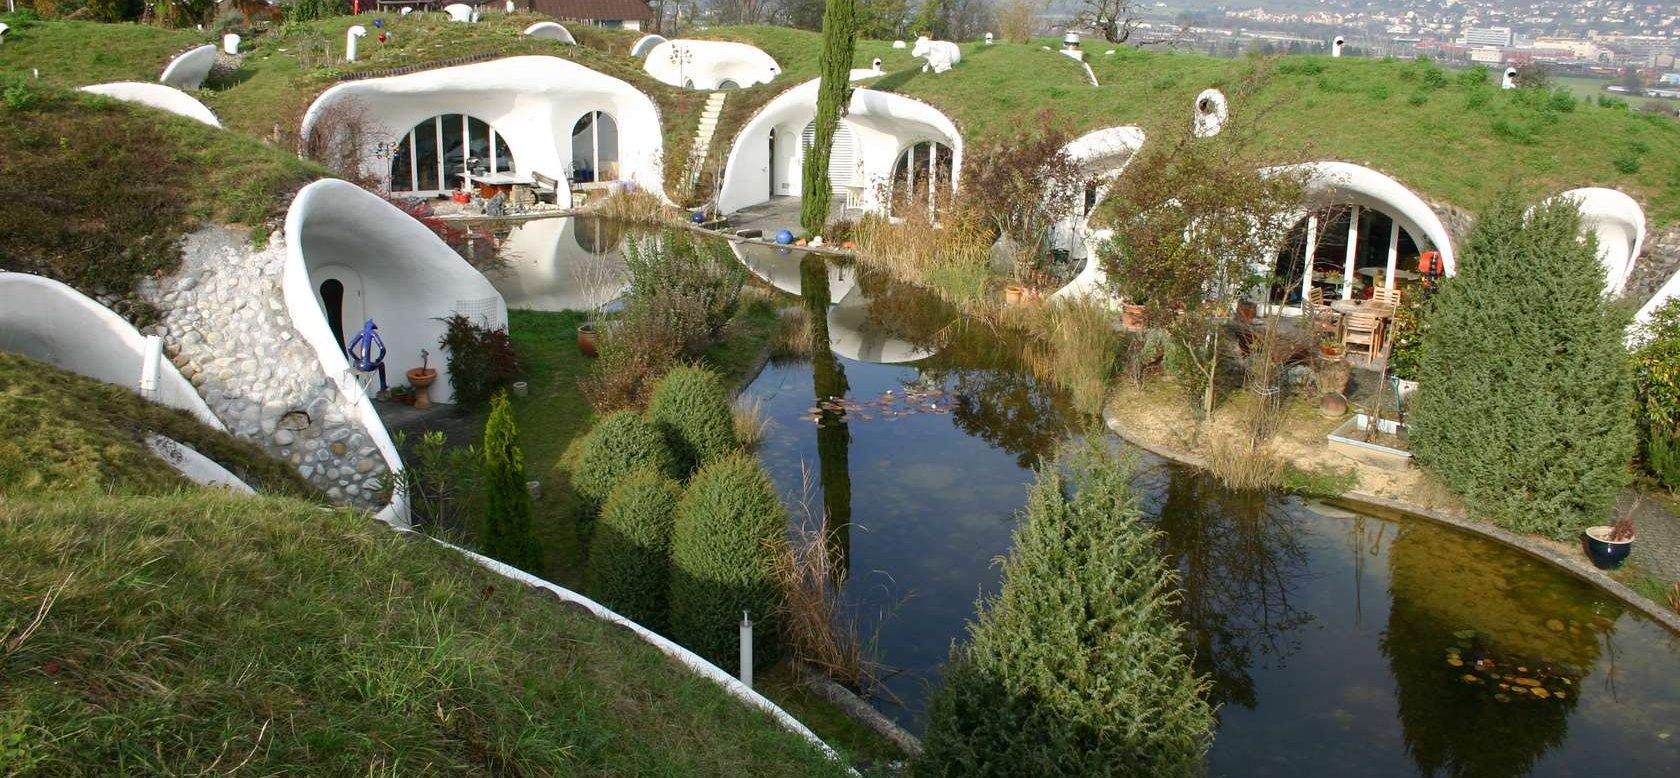 Earth House Estate Lättenstrasse – hobbit home